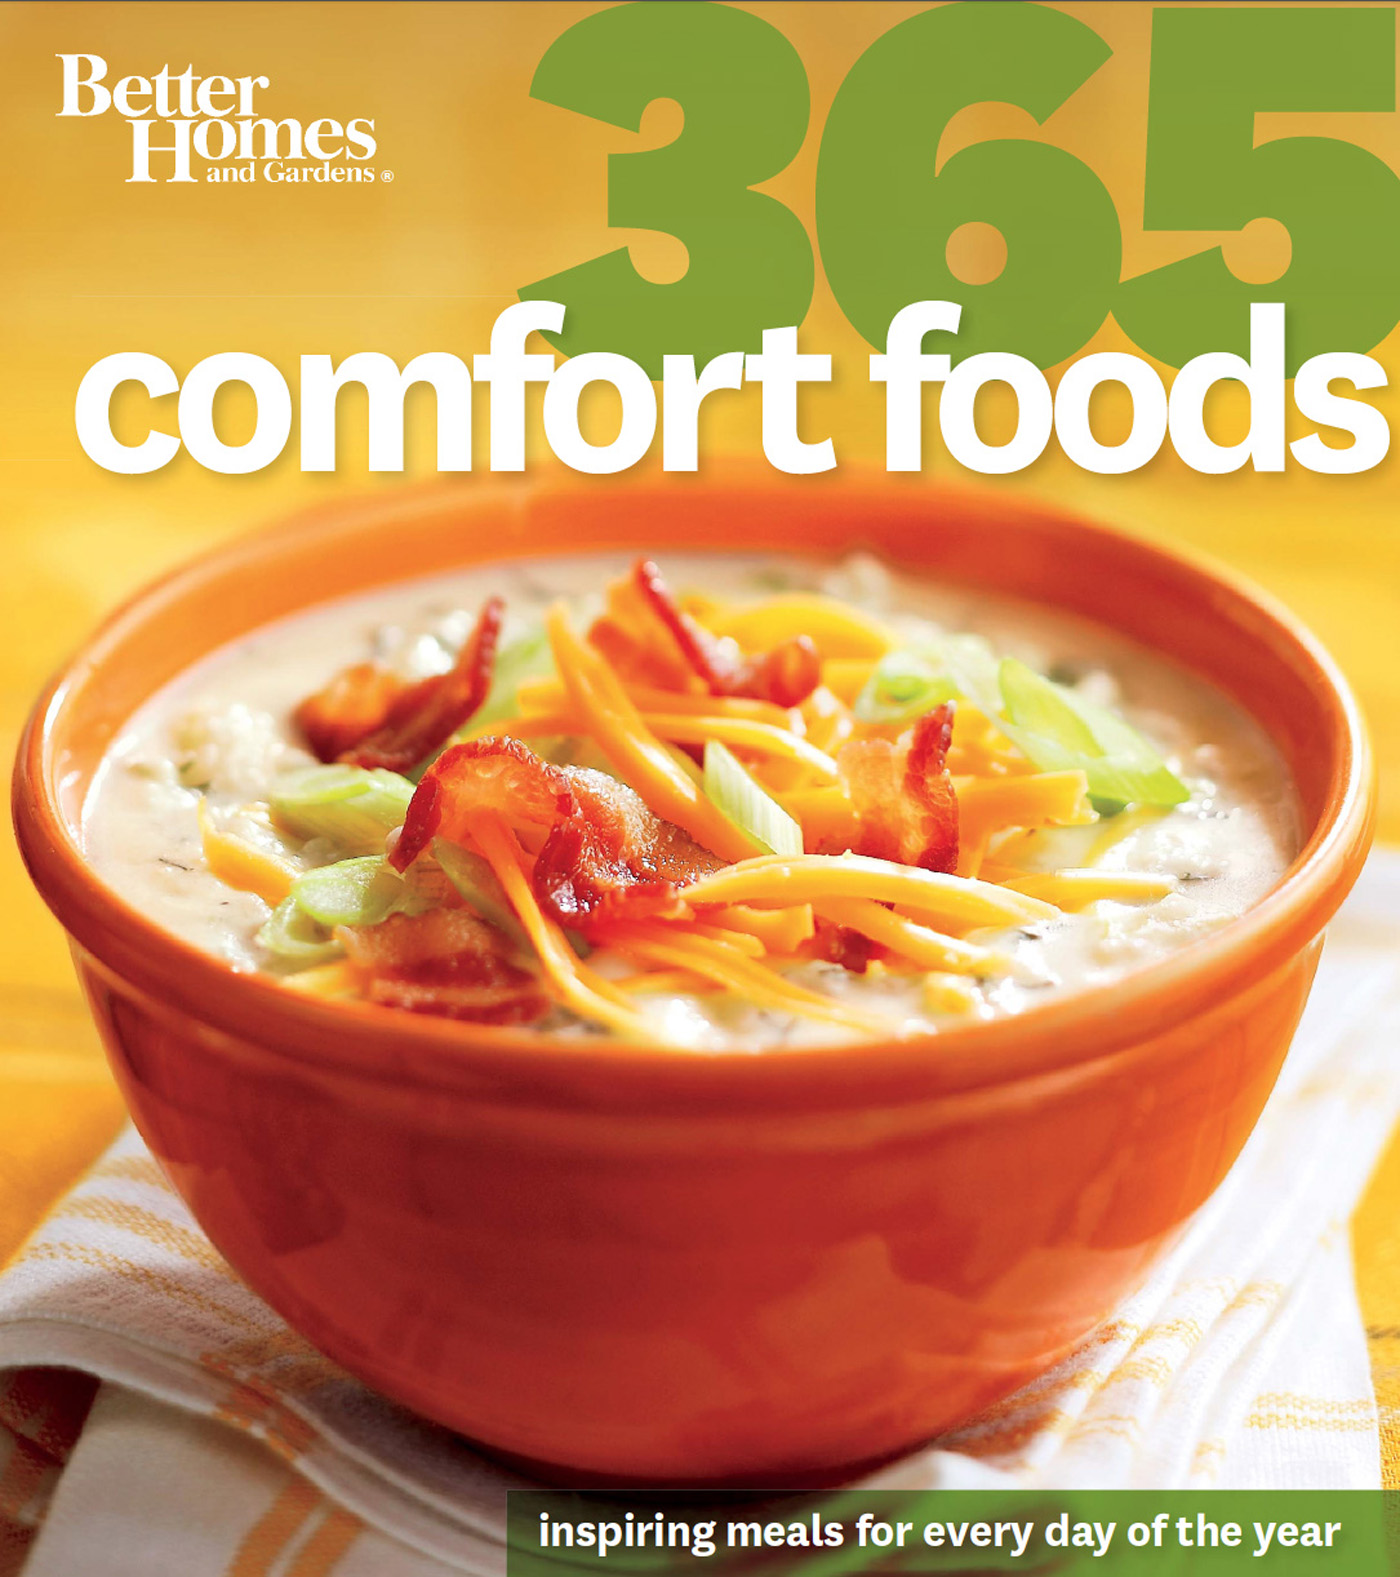 Better Homes and Gardens: 365 Comfort Foods